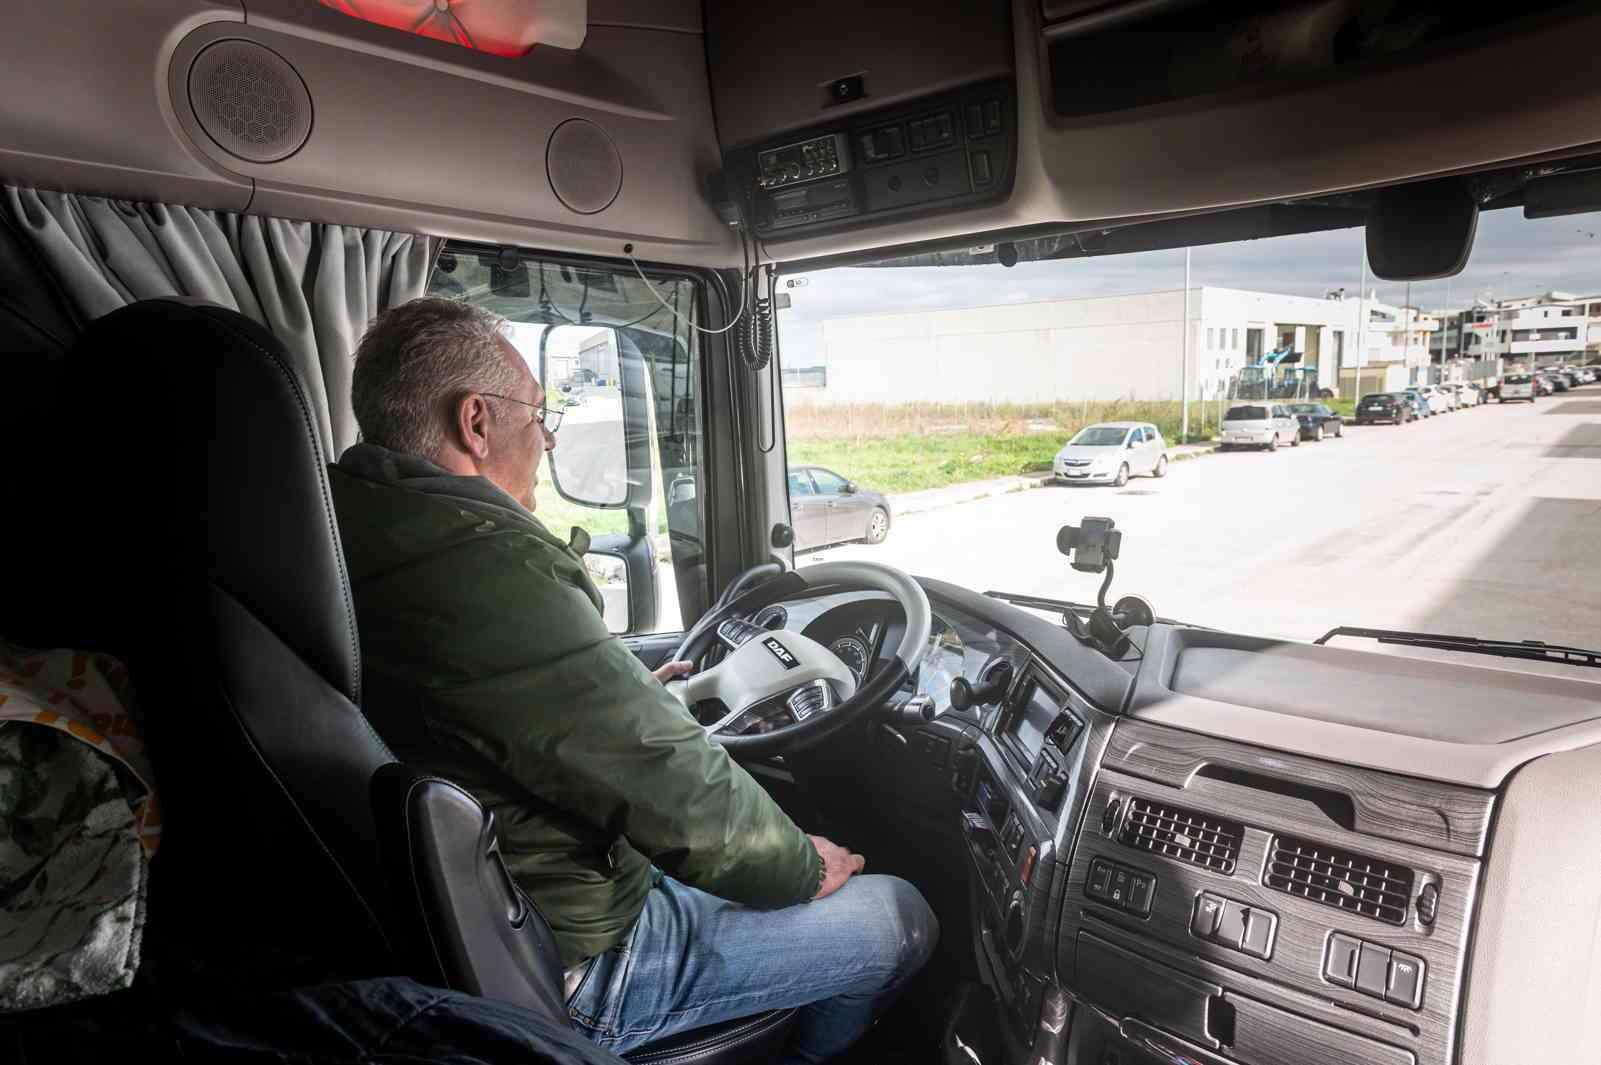 autotrasportatore-Monster-truck-gaatrasporti.it-02